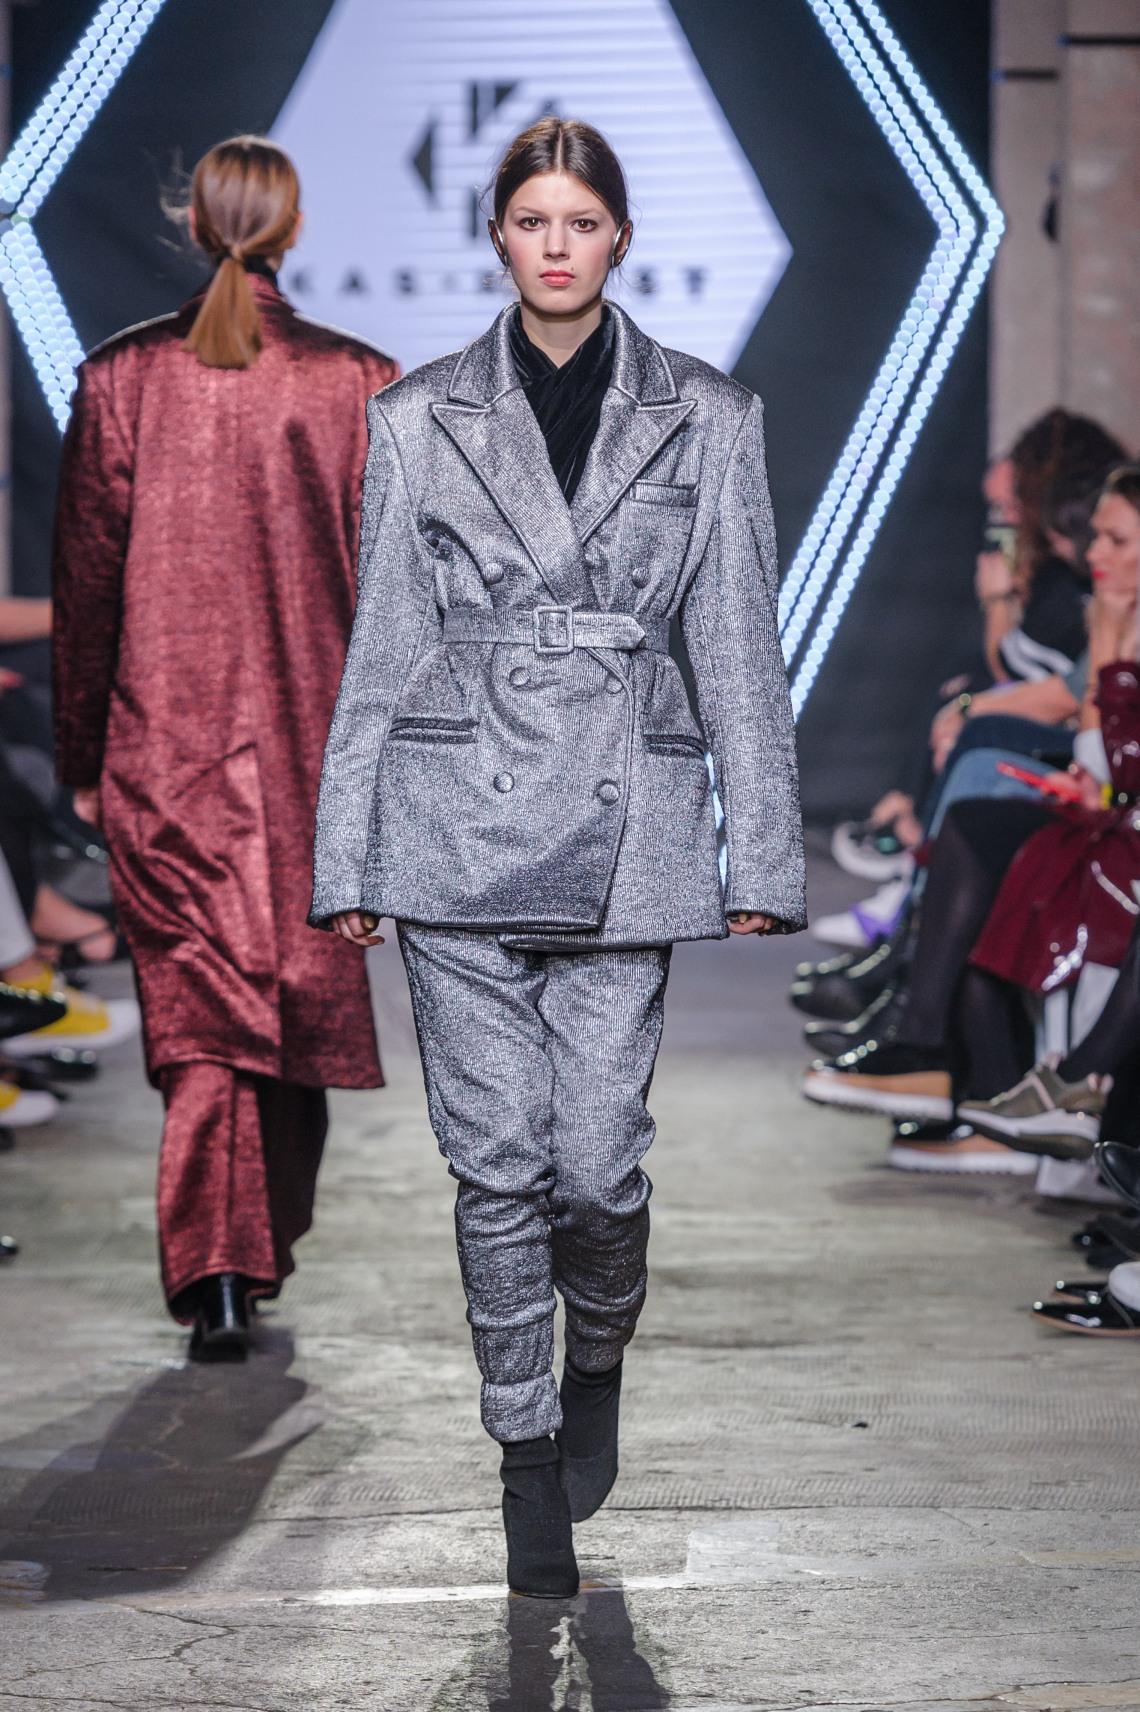 4ktw-101118_15-kaskryst_highres_fotfilipokopny-fashionimages